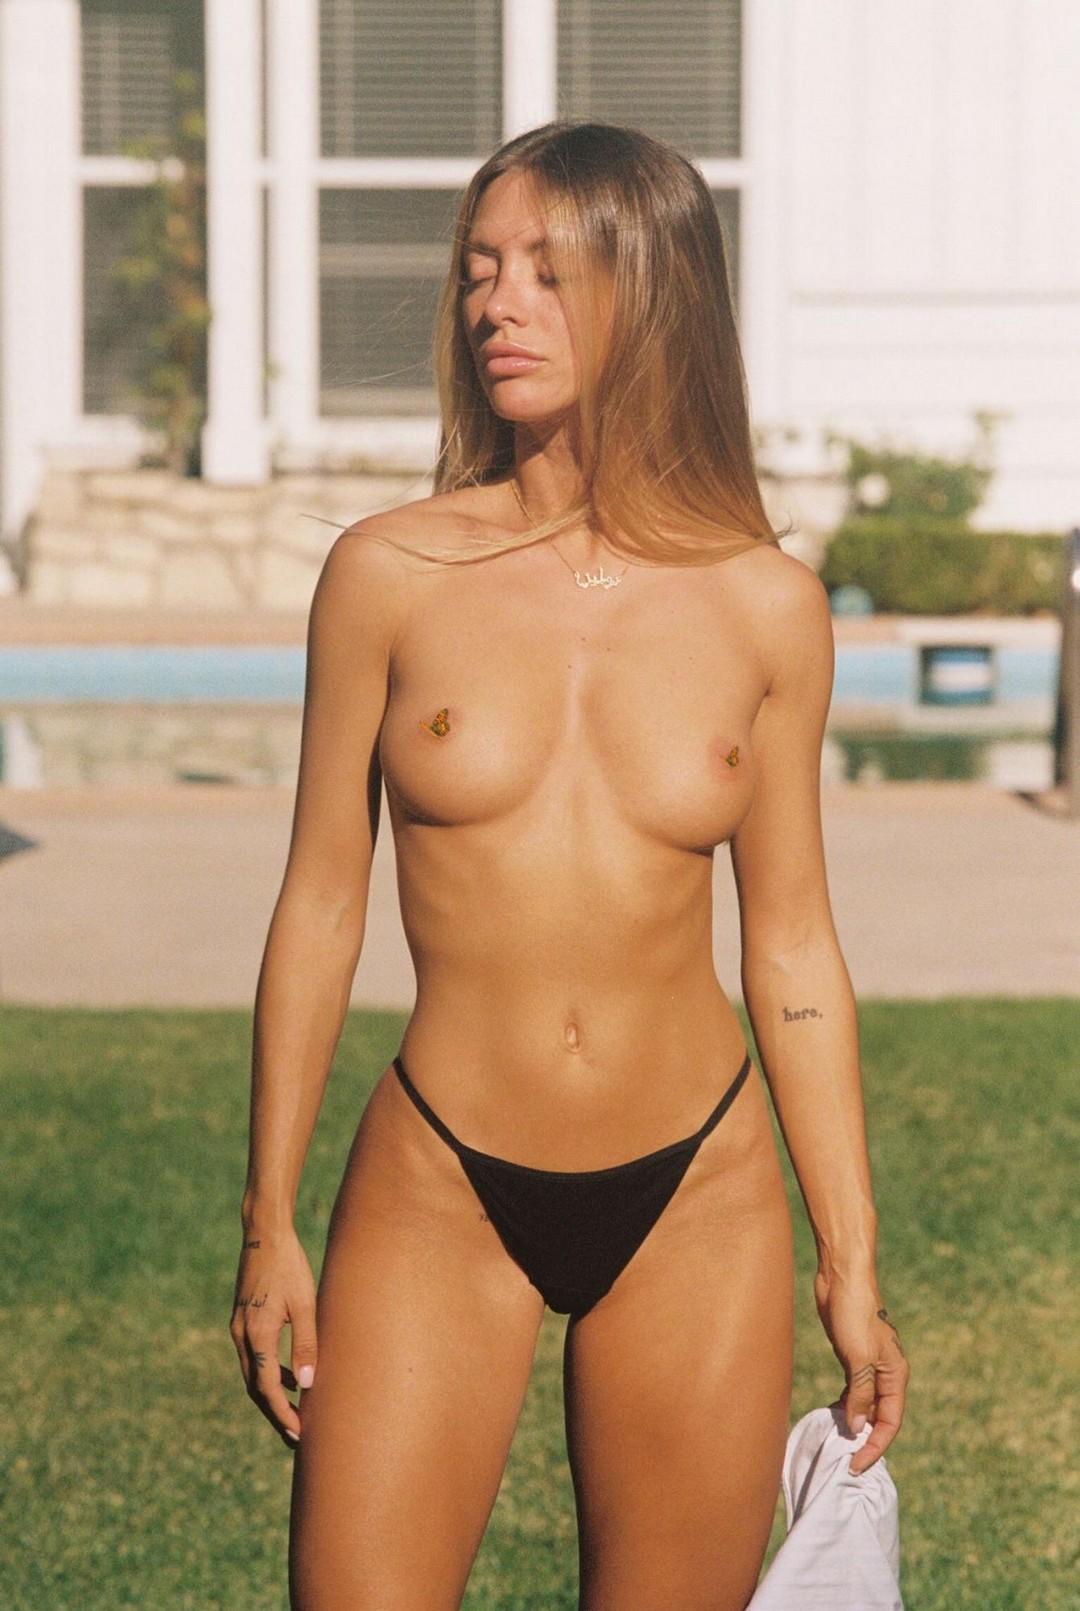 polina-paulina-bikini-boobs-transexual-tube-porno